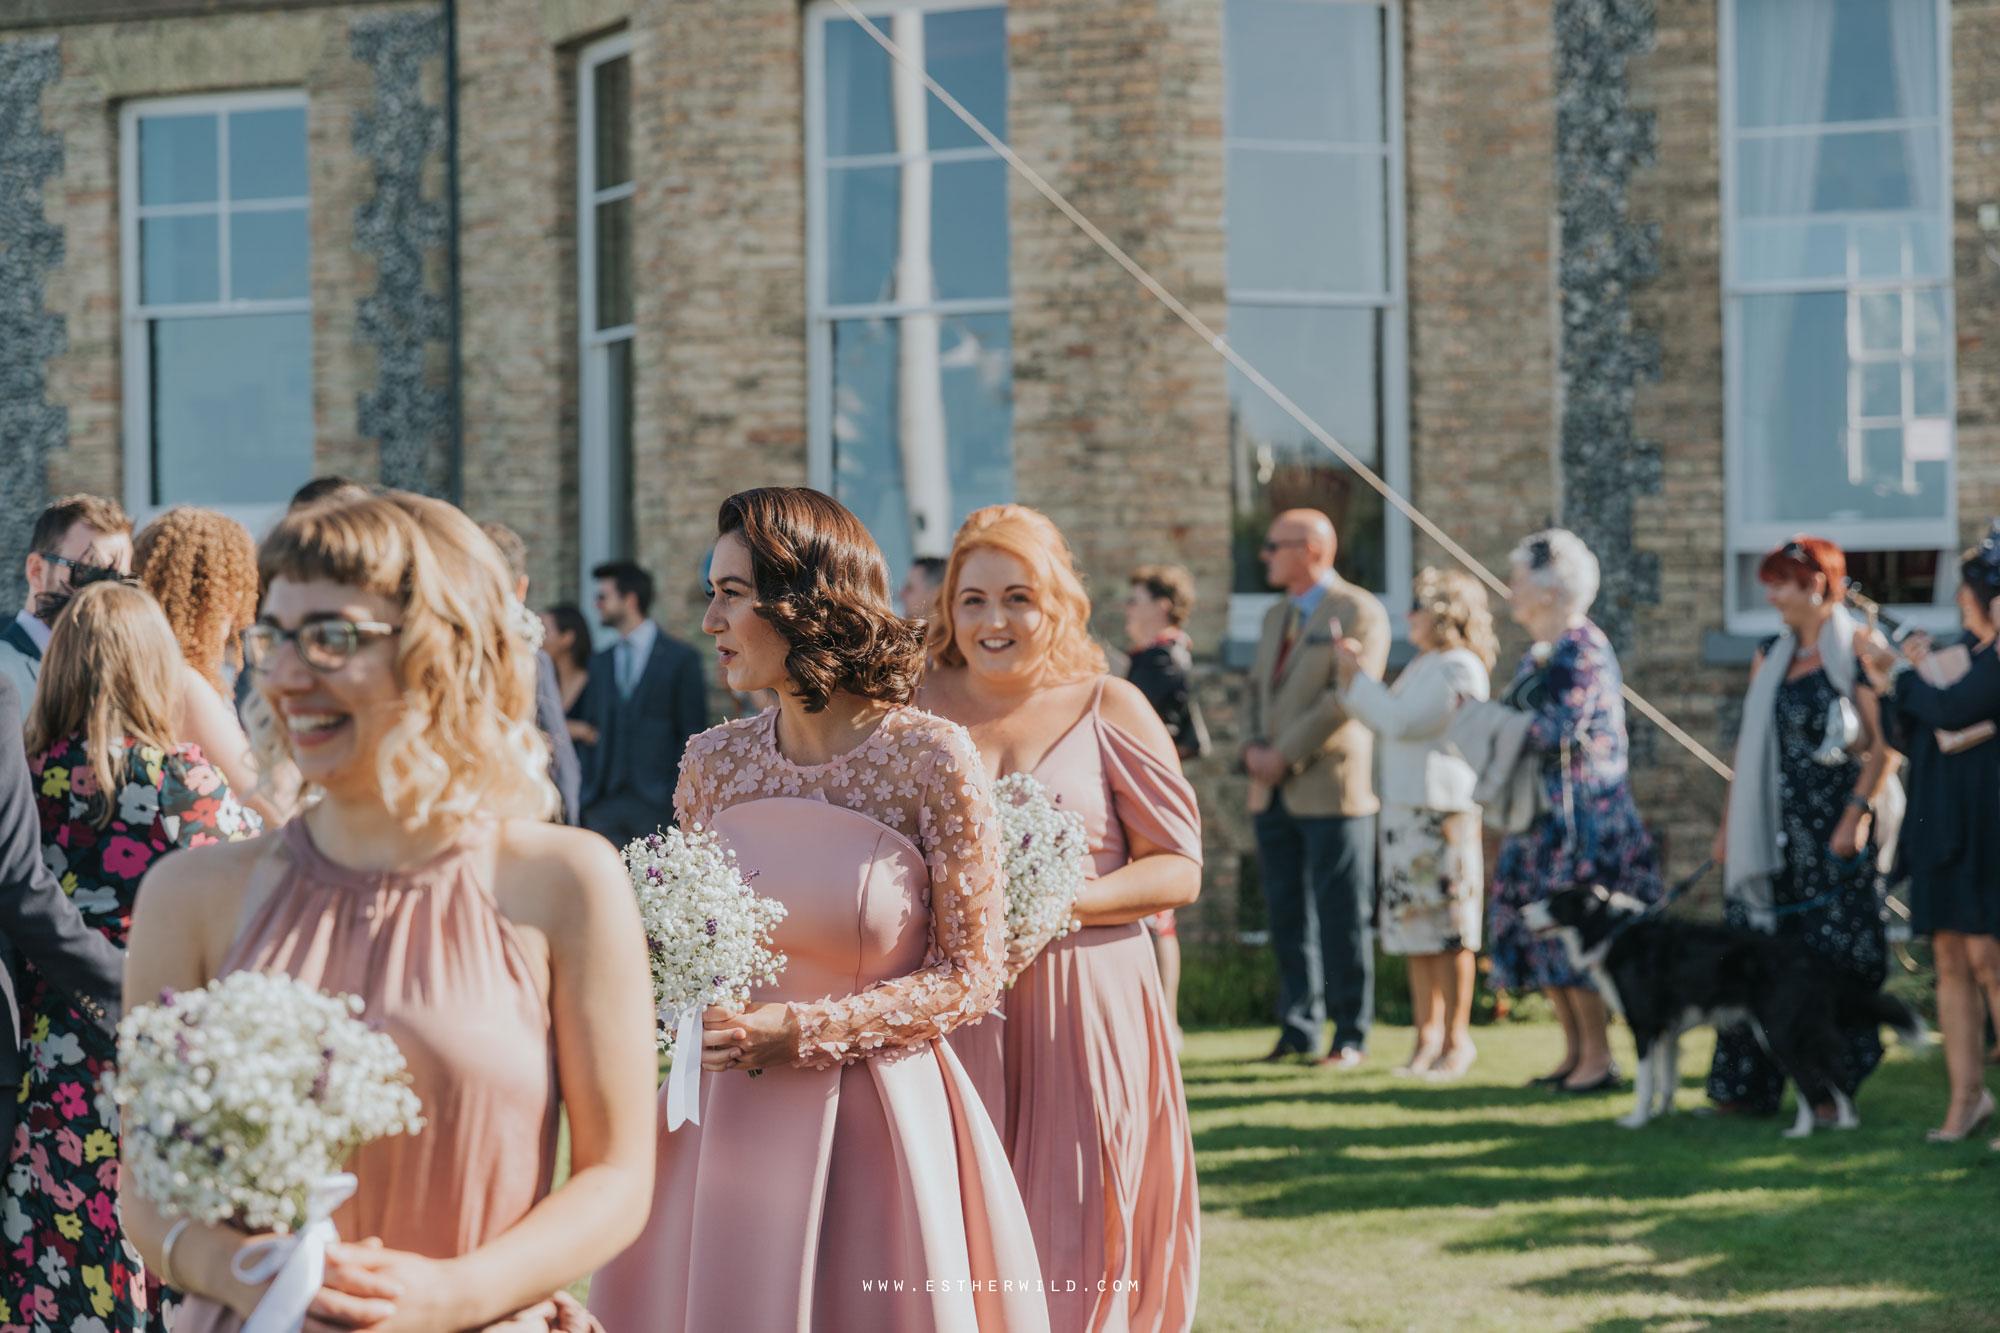 Cromer_Wedding_Beach_Outdoor_Ceremony_Norfolk_North_Lodge_Registry_Office_Rocket_House_Cafe_Cromer_Pier_IMG_3681.jpg